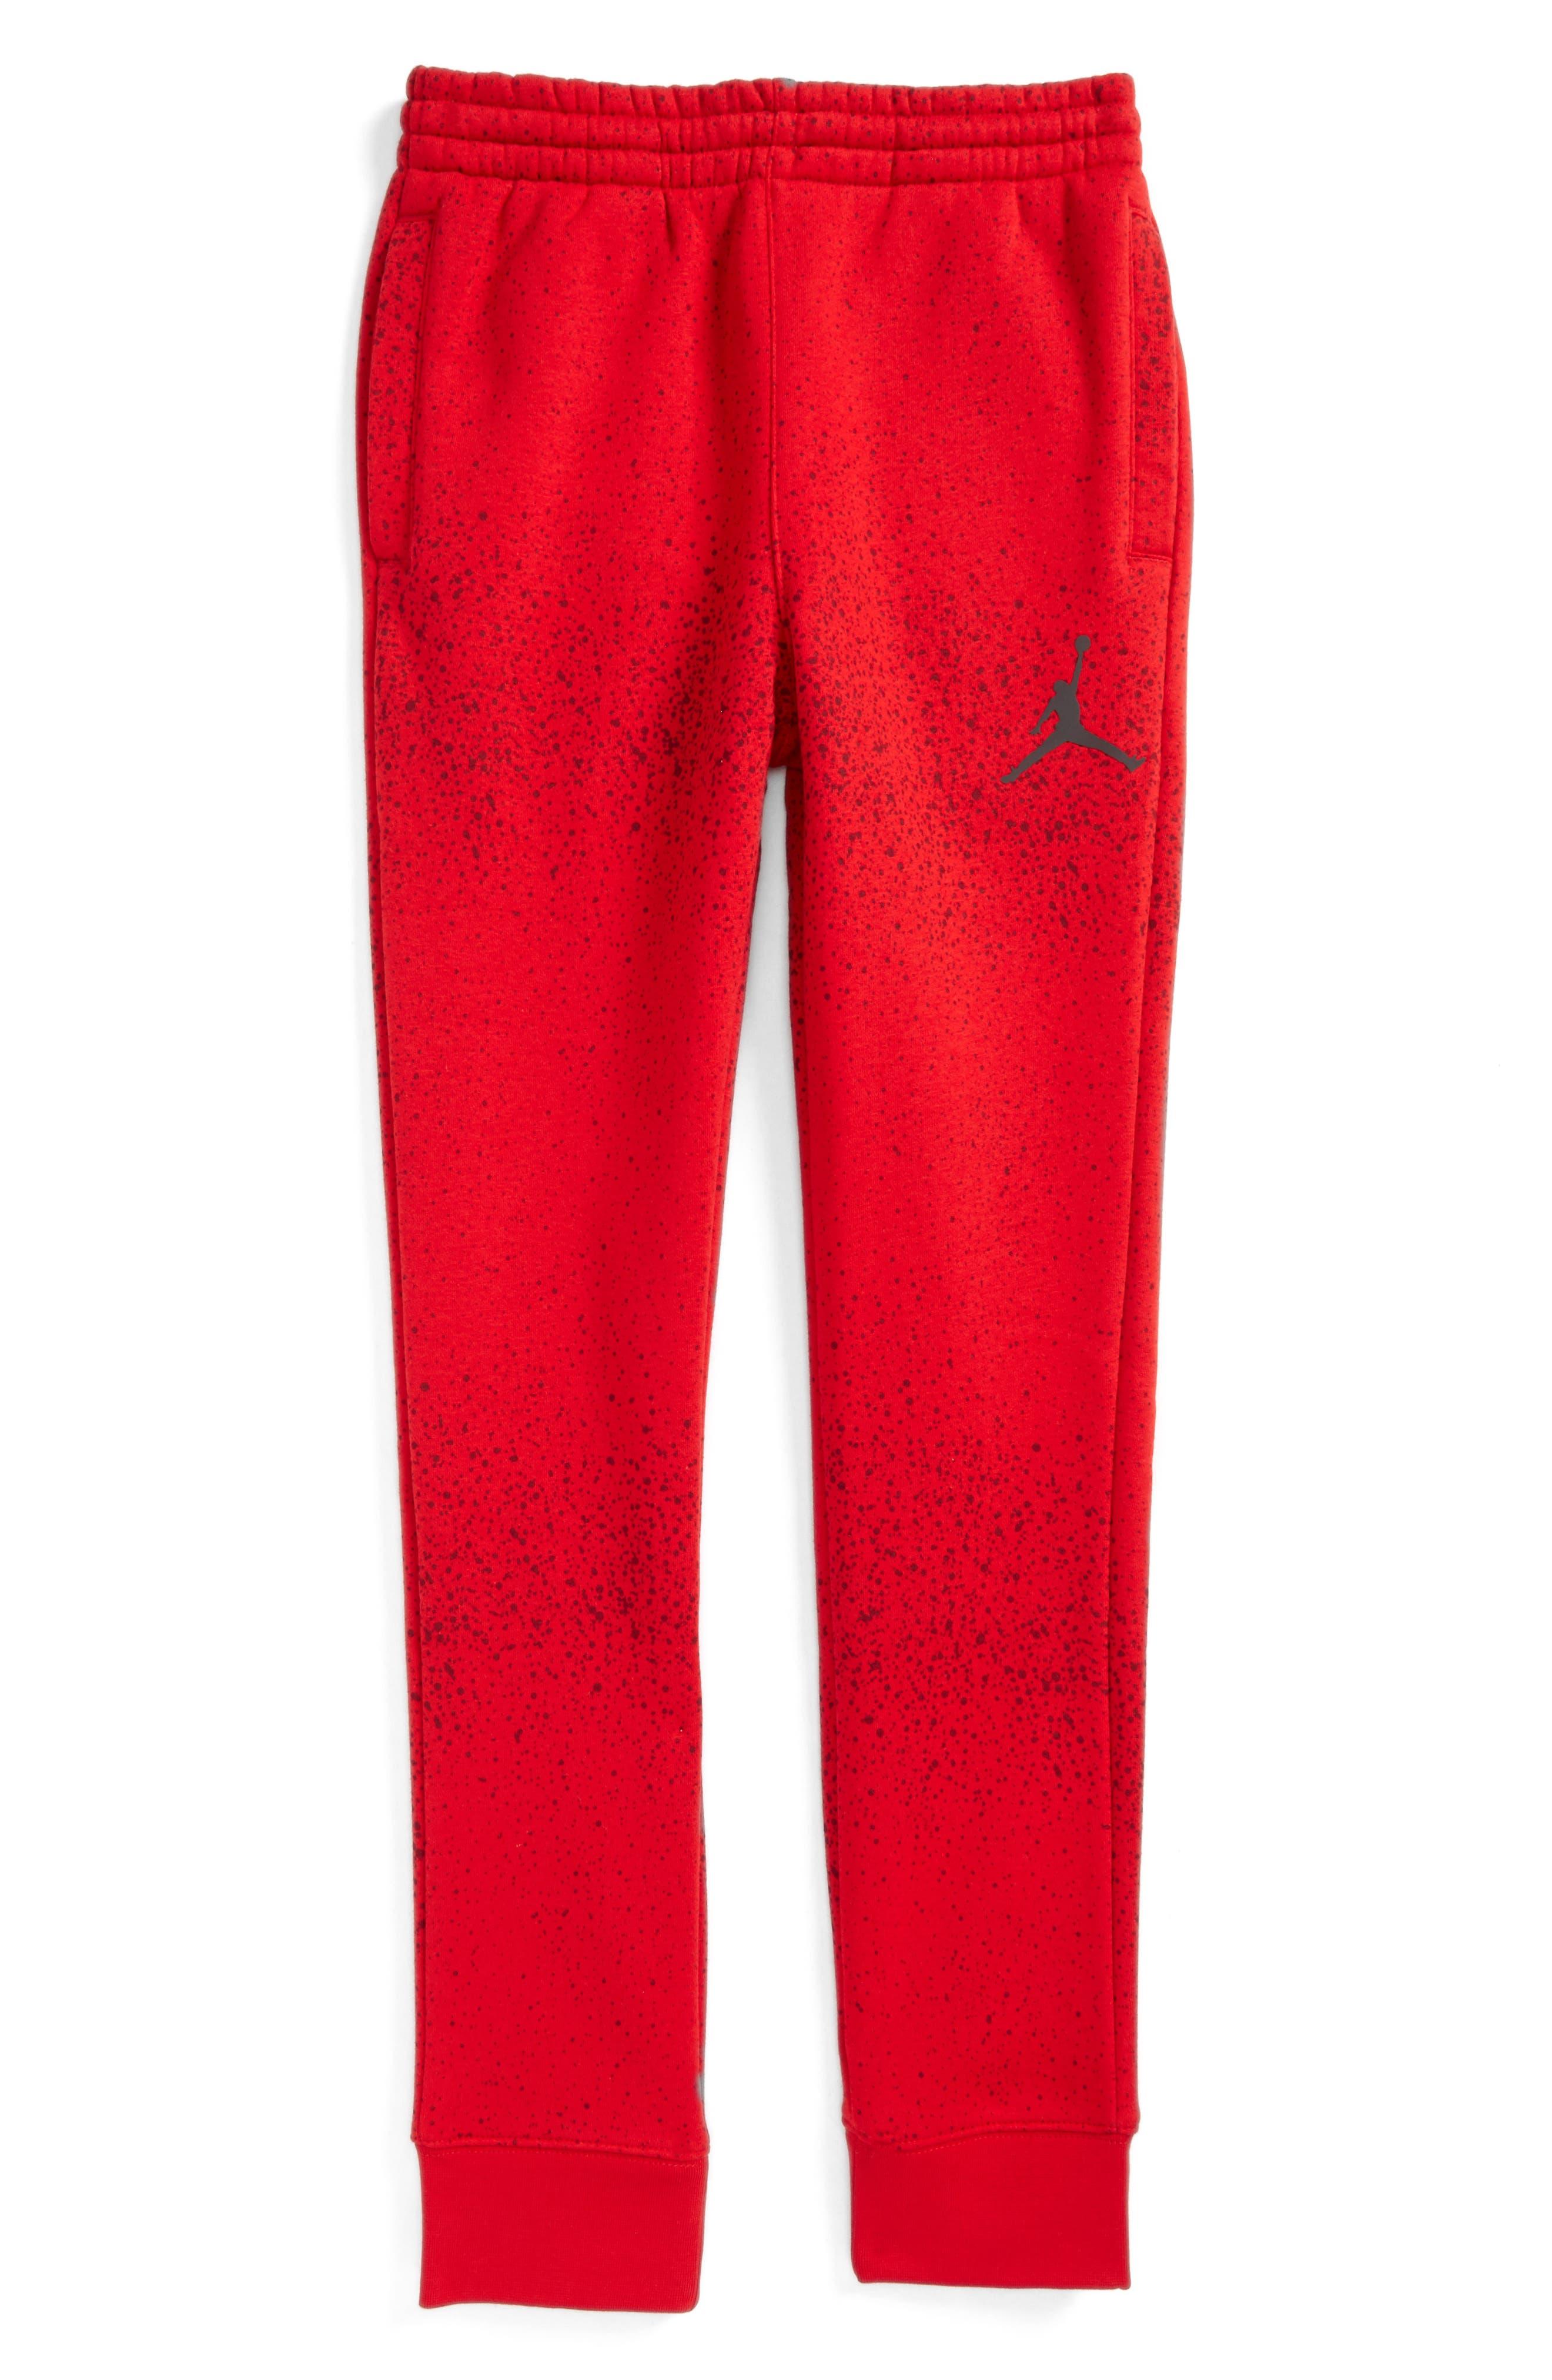 Alternate Image 1 Selected - Jordan Flight Sweatpants (Big Boys)